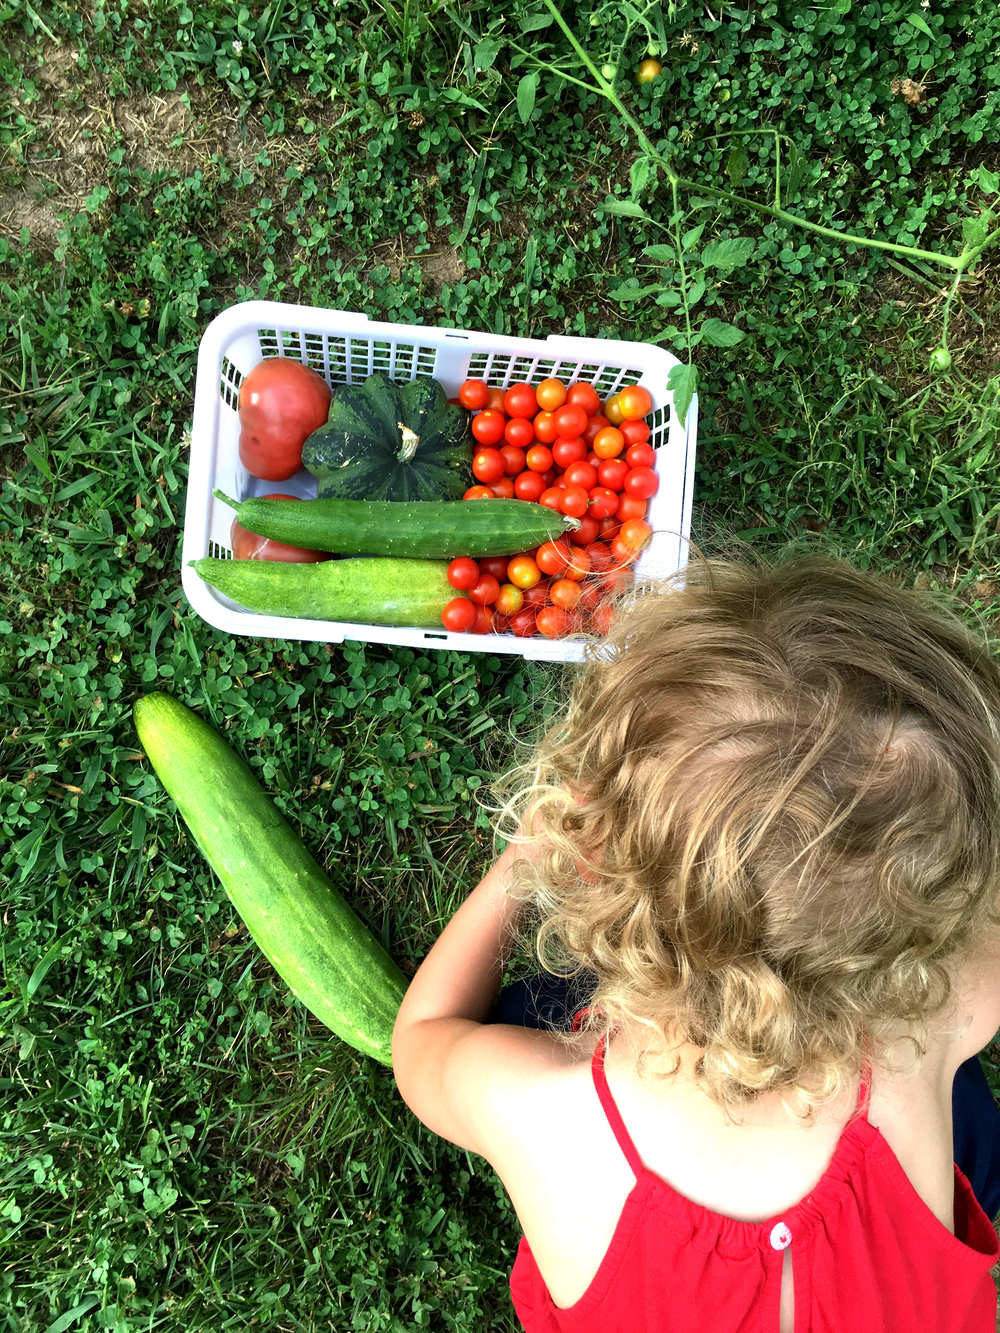 Hattie picking tomatoes 2 July 2016